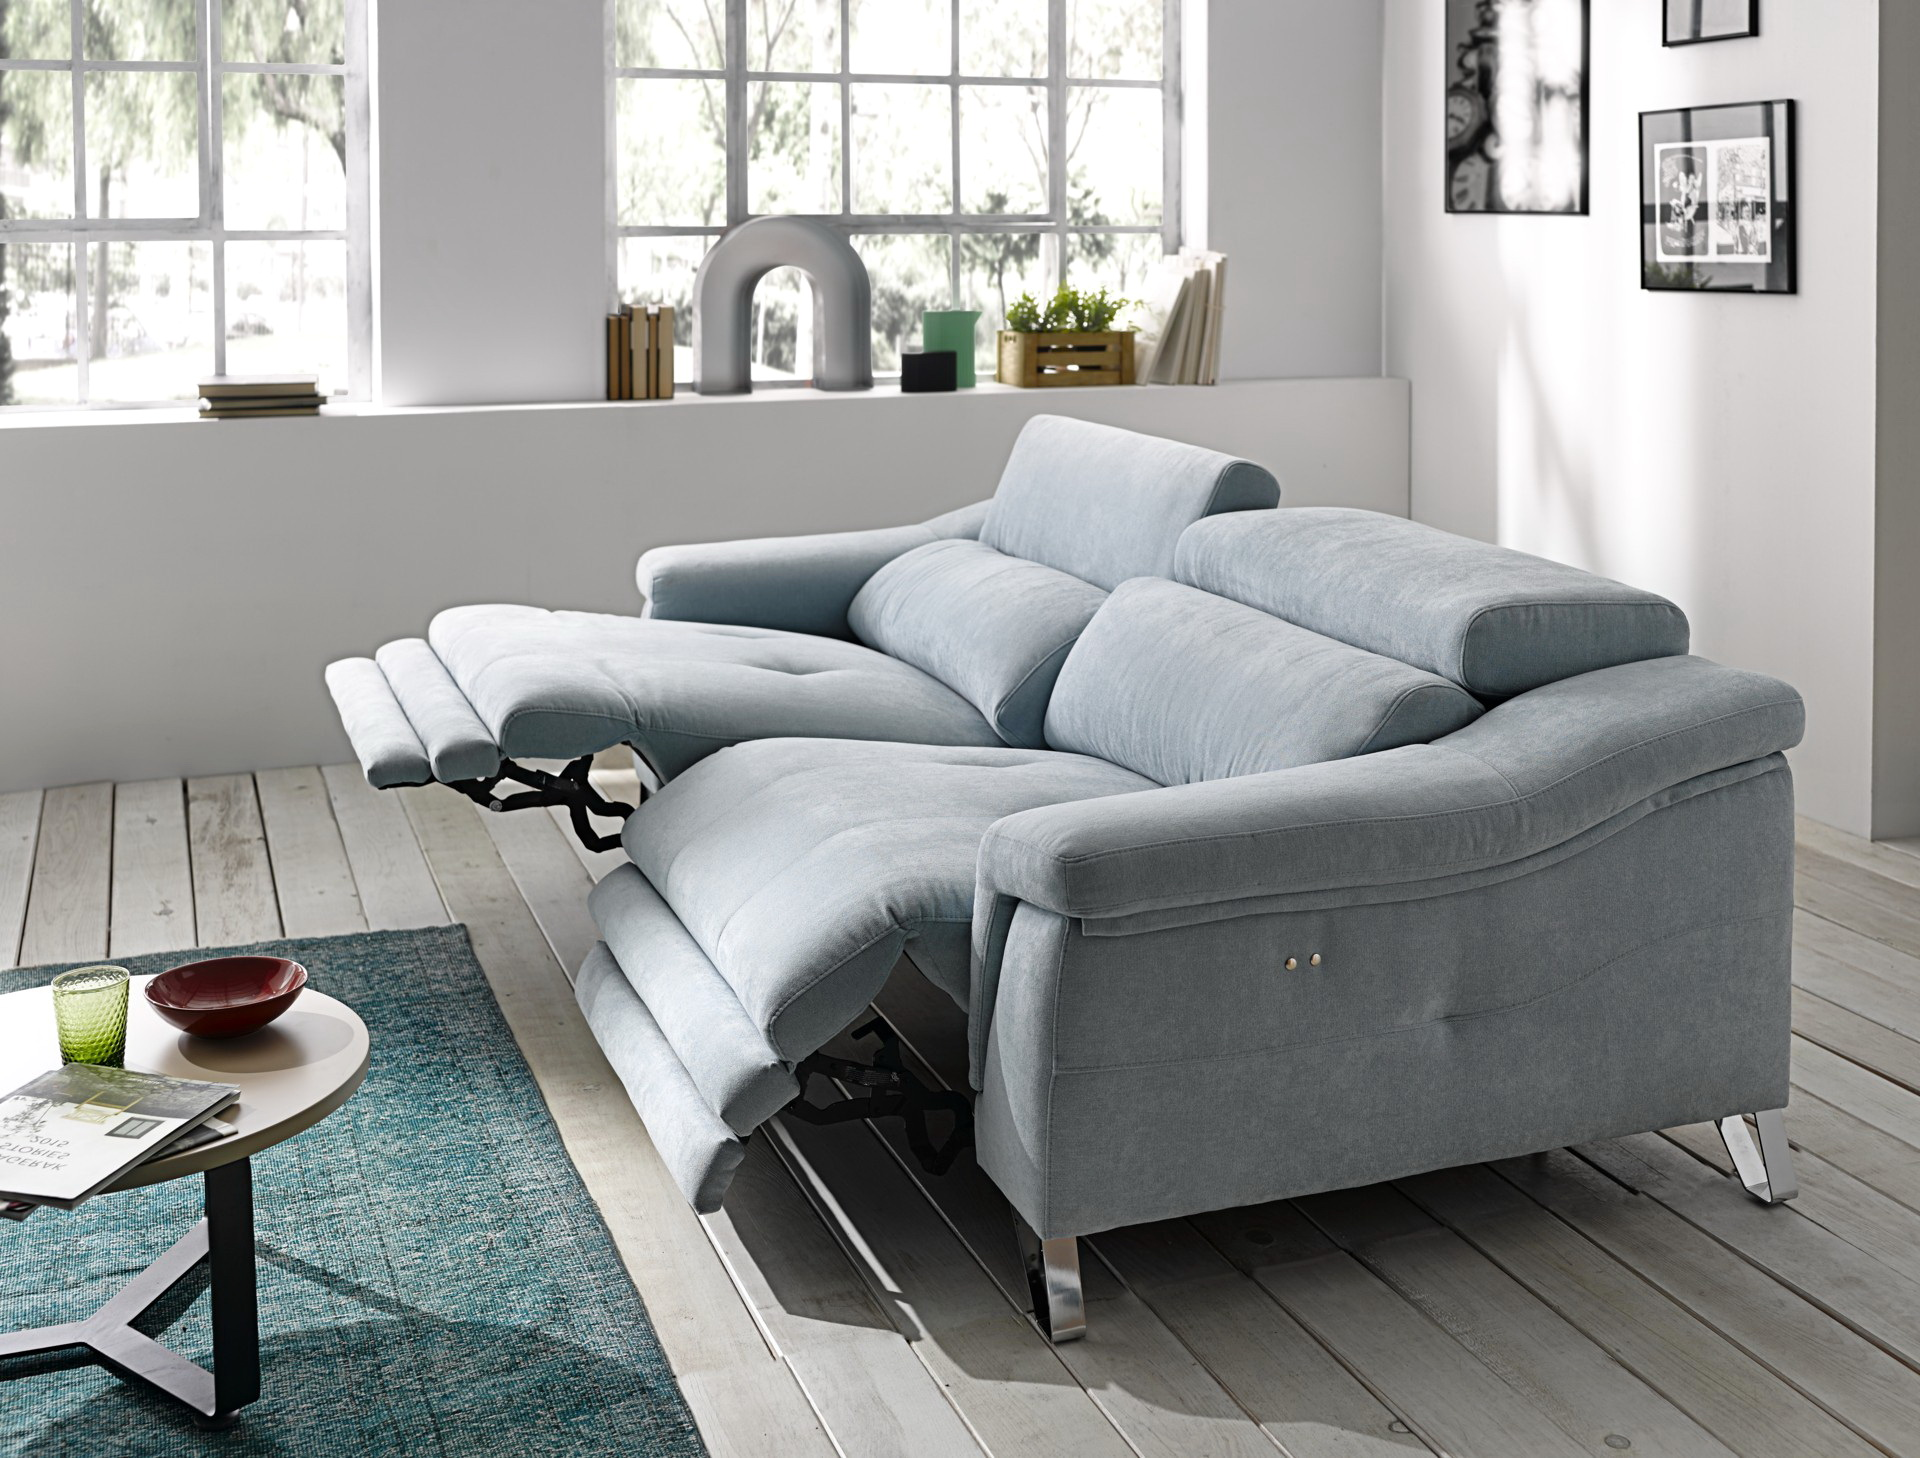 MIRELLA sofá modular relax eléctrico by Pedro Ortiz 3 PLAZAS R.E. 1 grande distribuido por Muebles Antoñán León